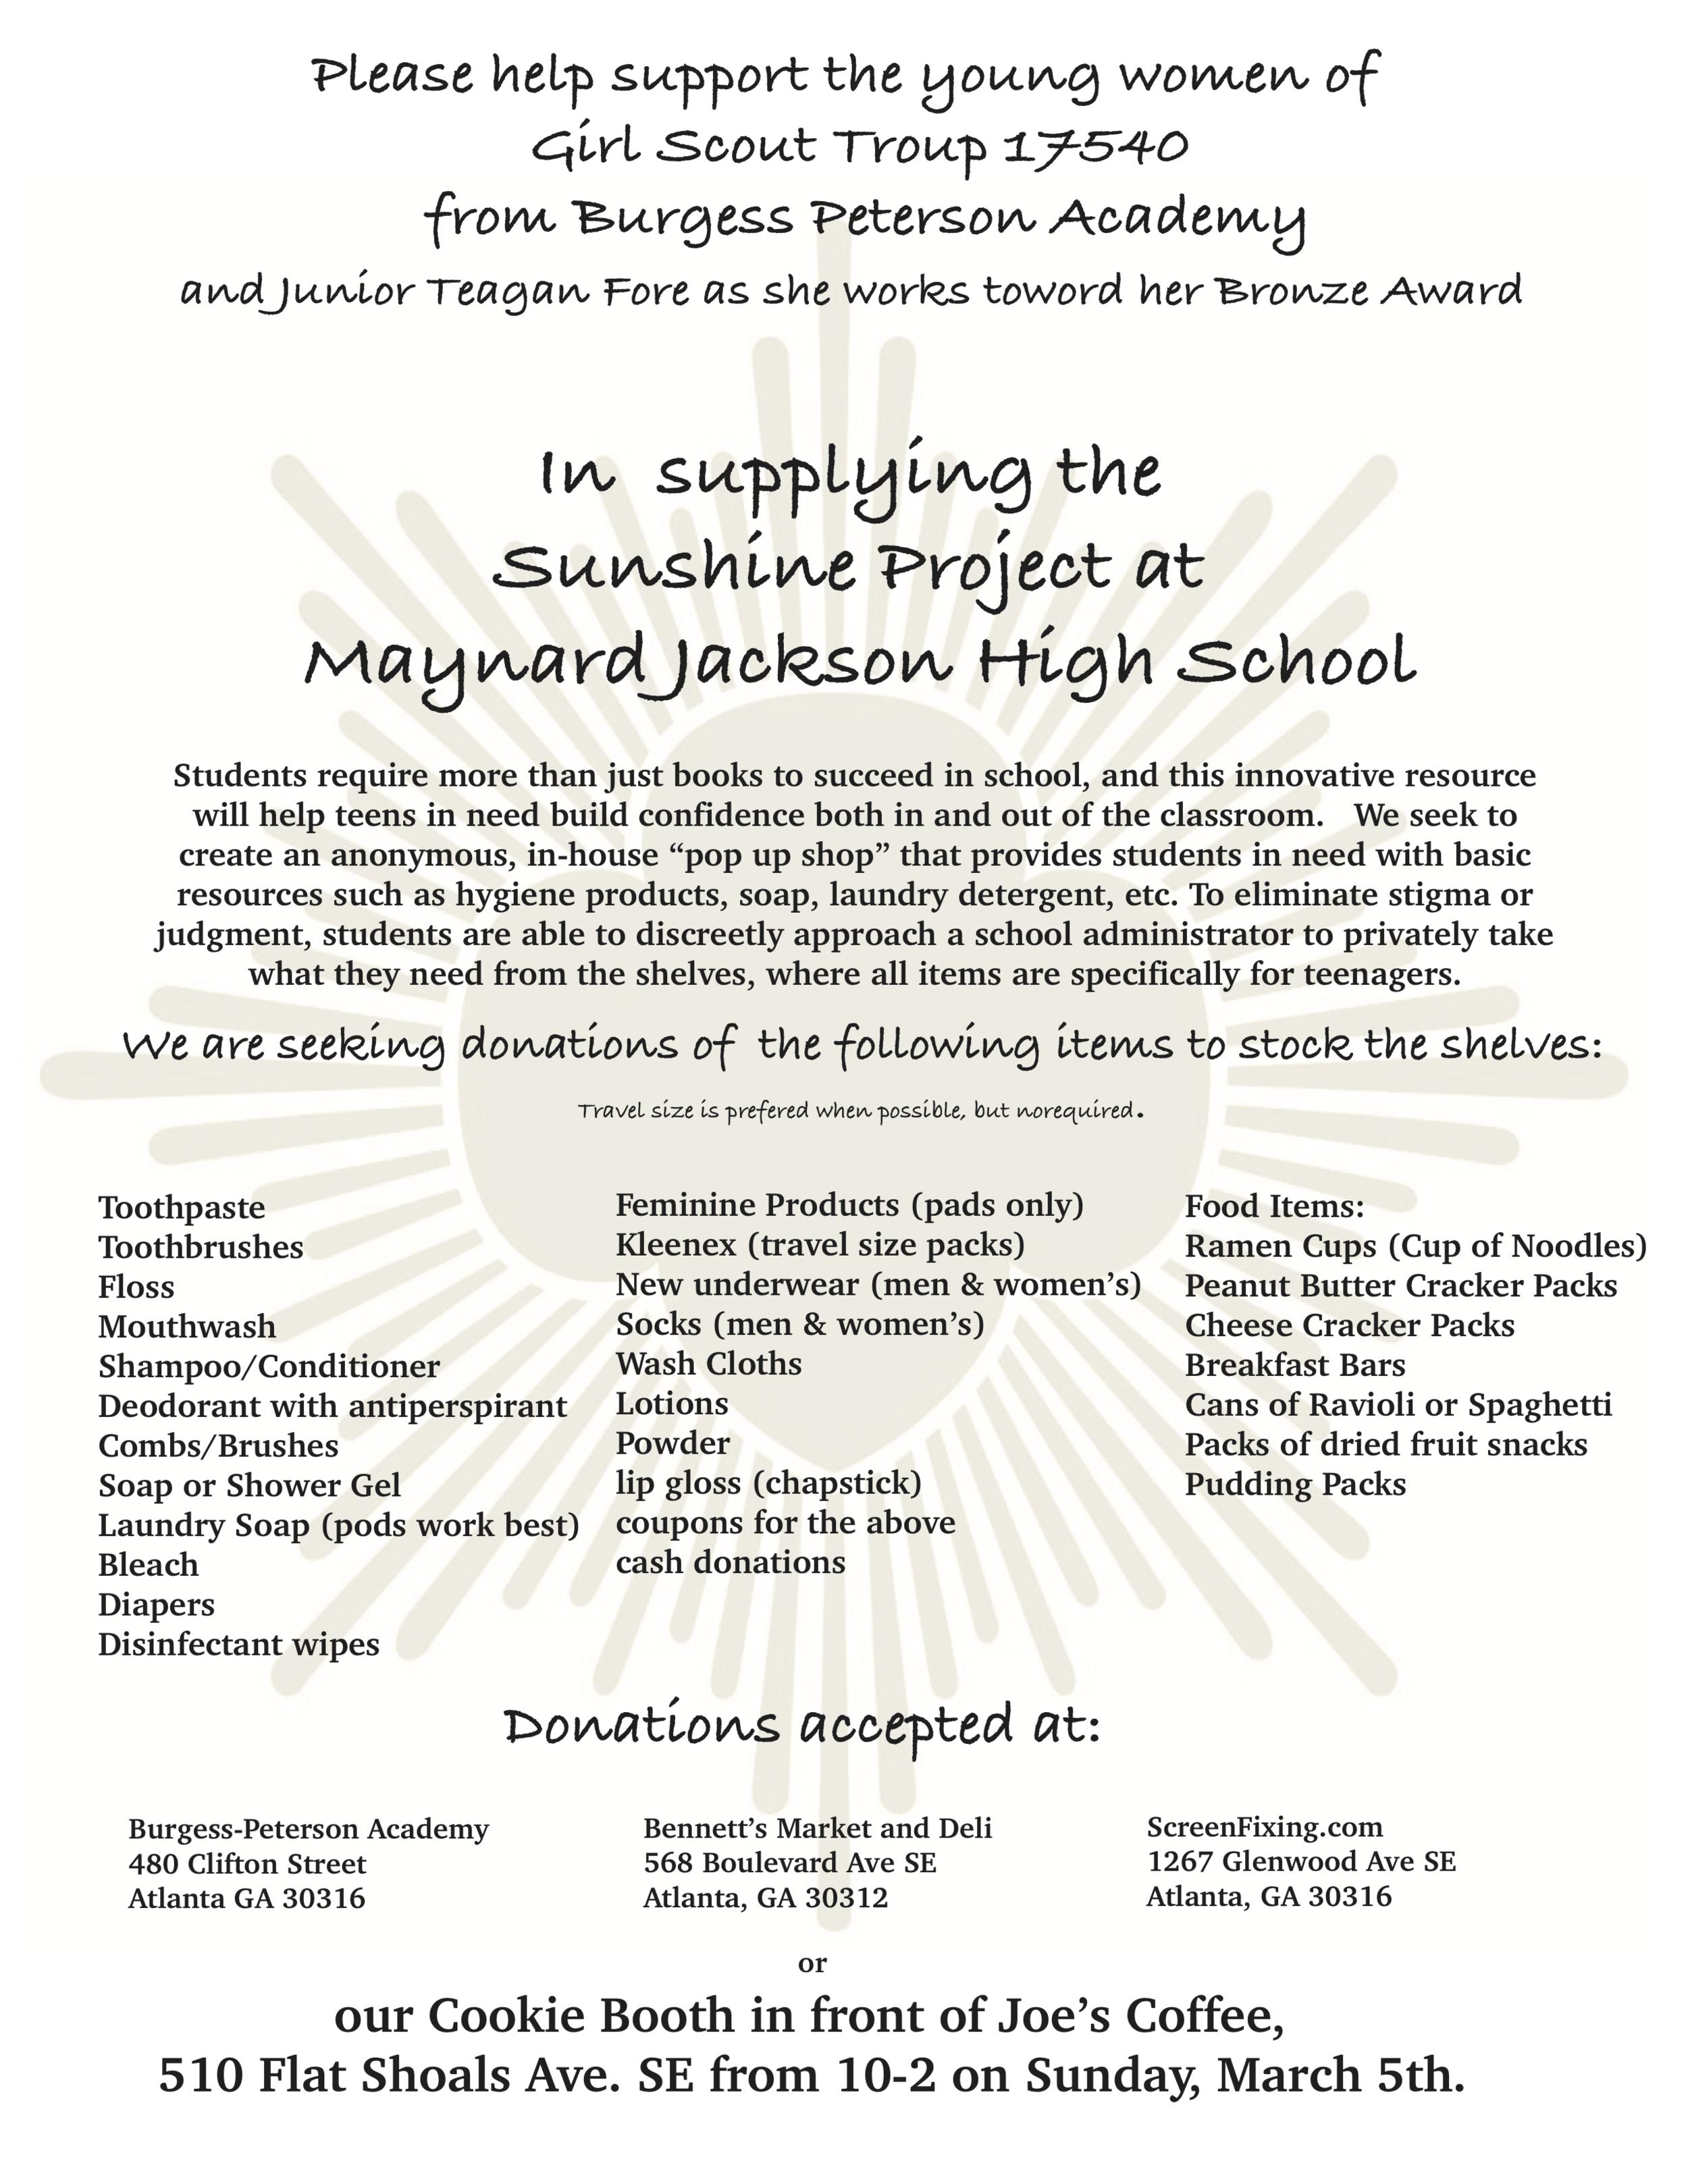 Sunshine Project at Maynard Jackson High School